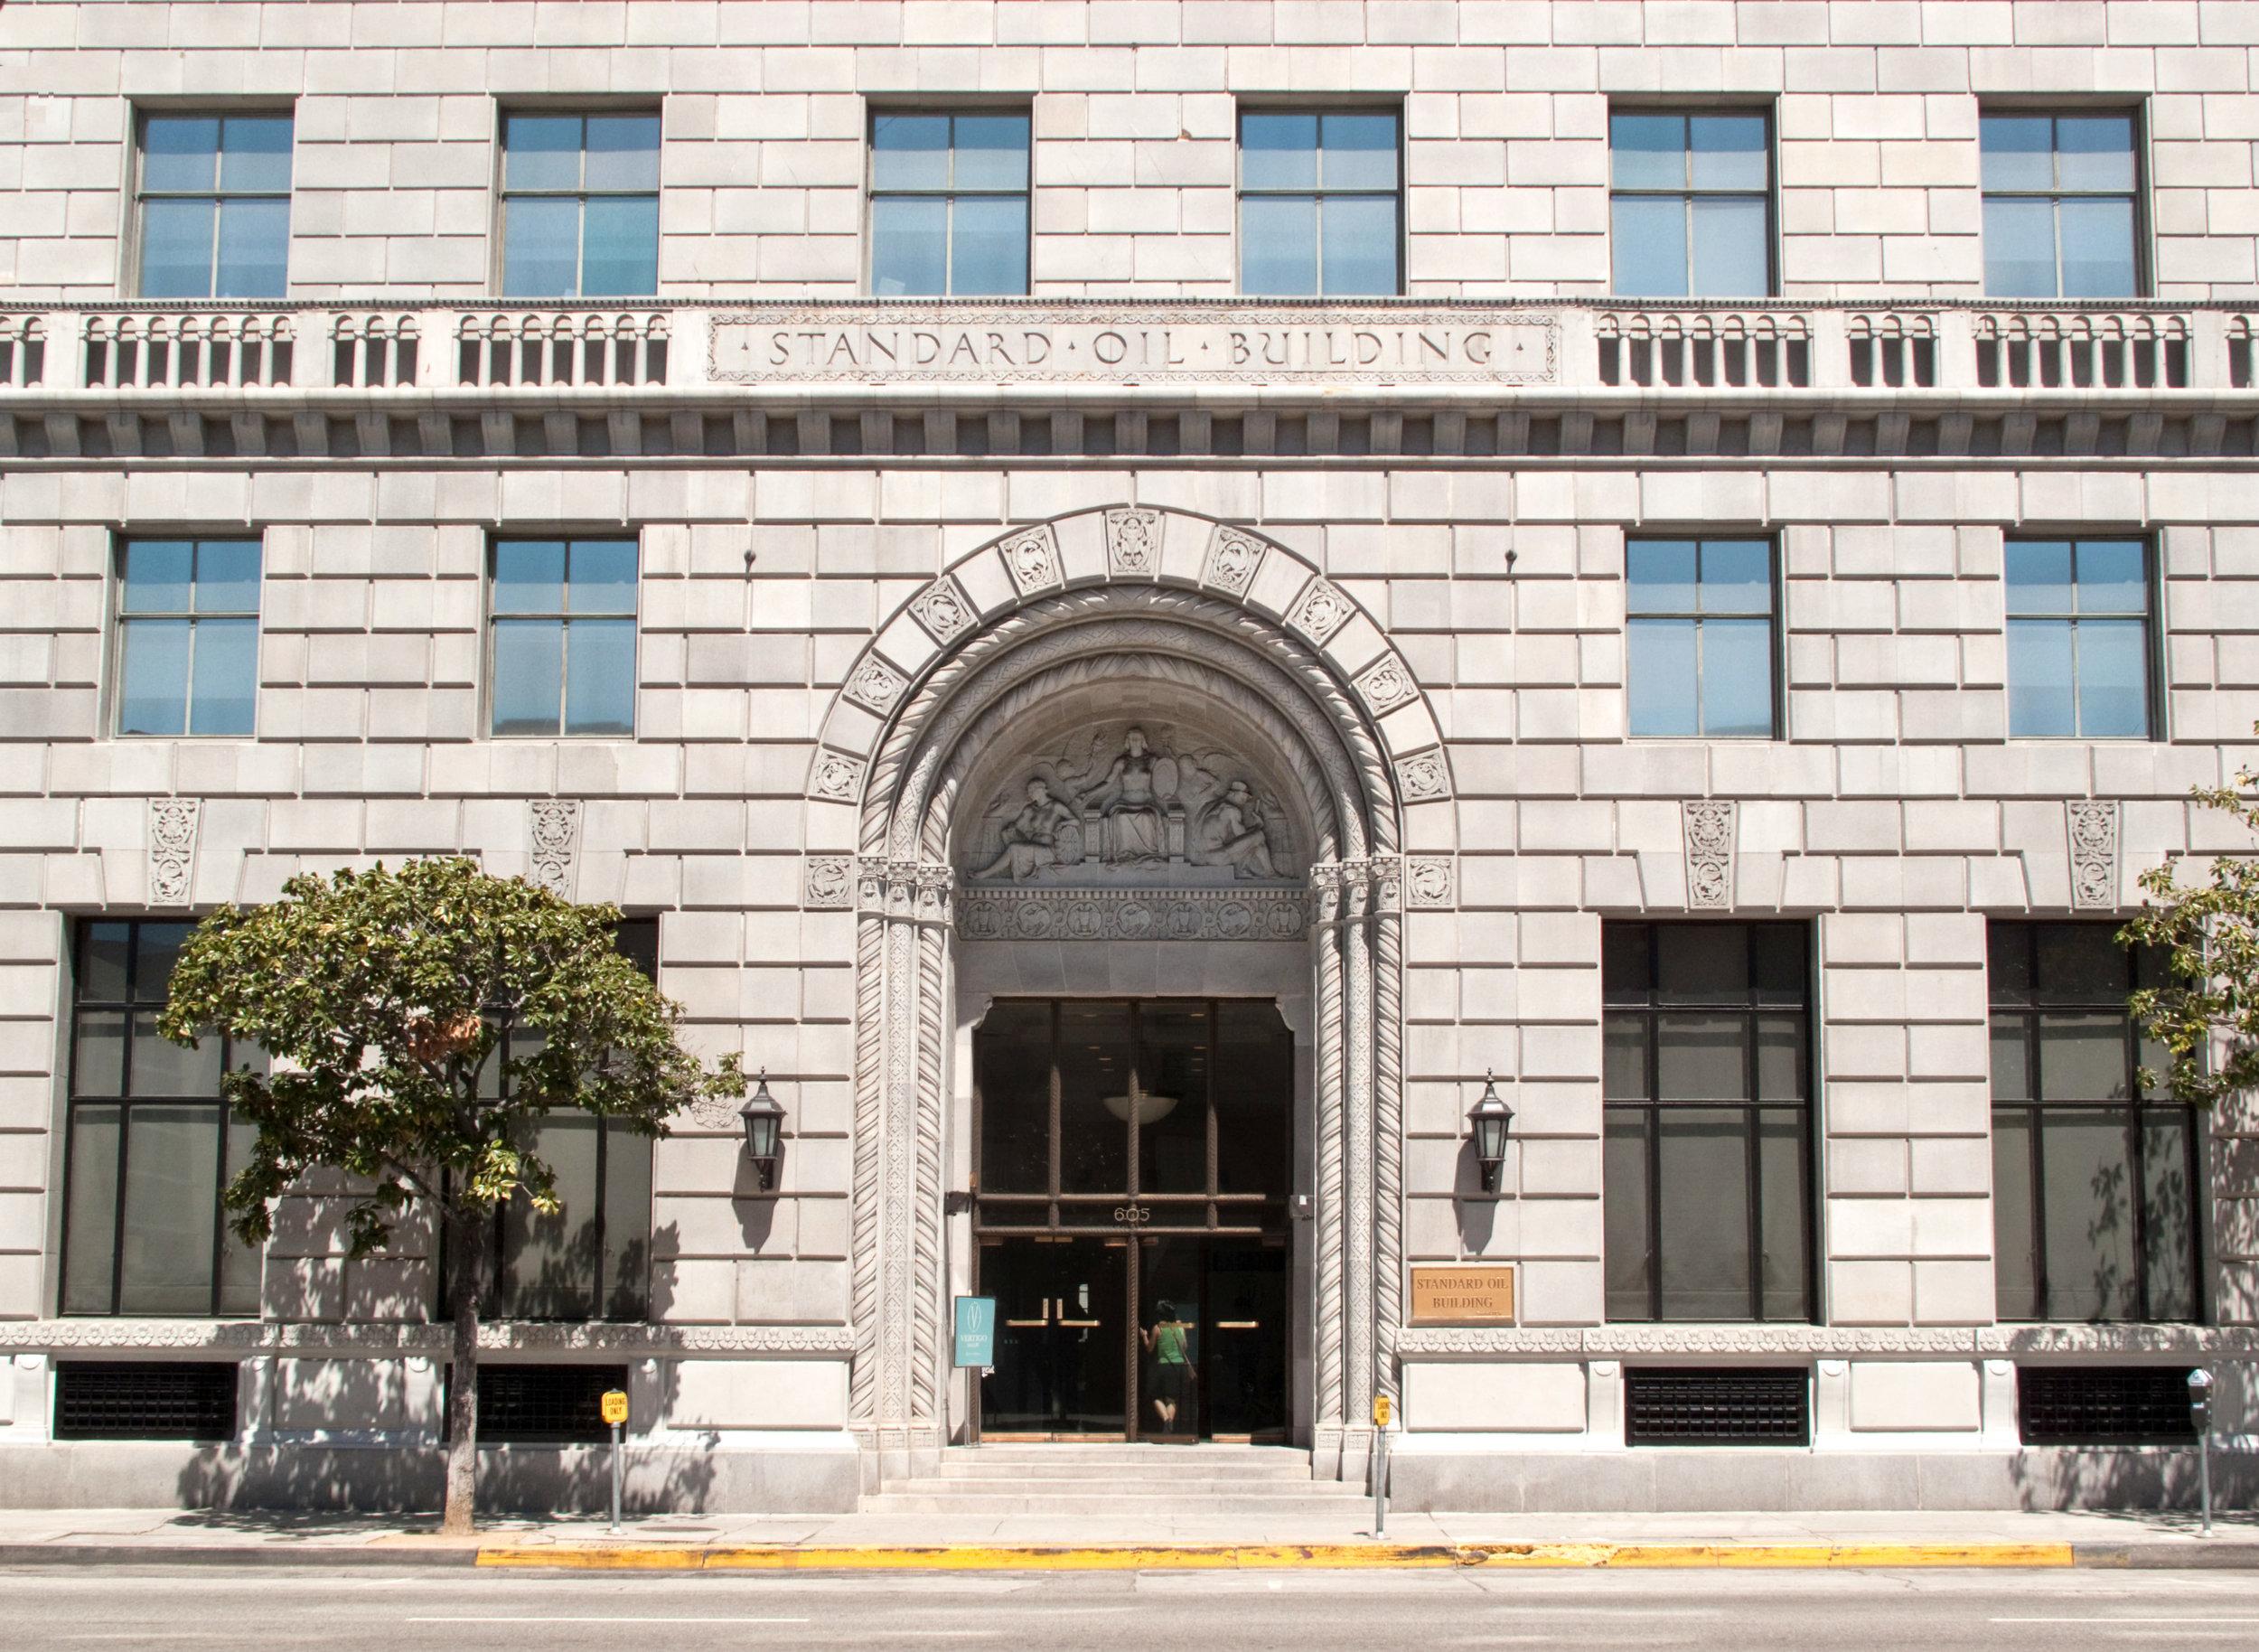 Standard_Oil_Company_Building_entrance,_Los_Angeles.jpg